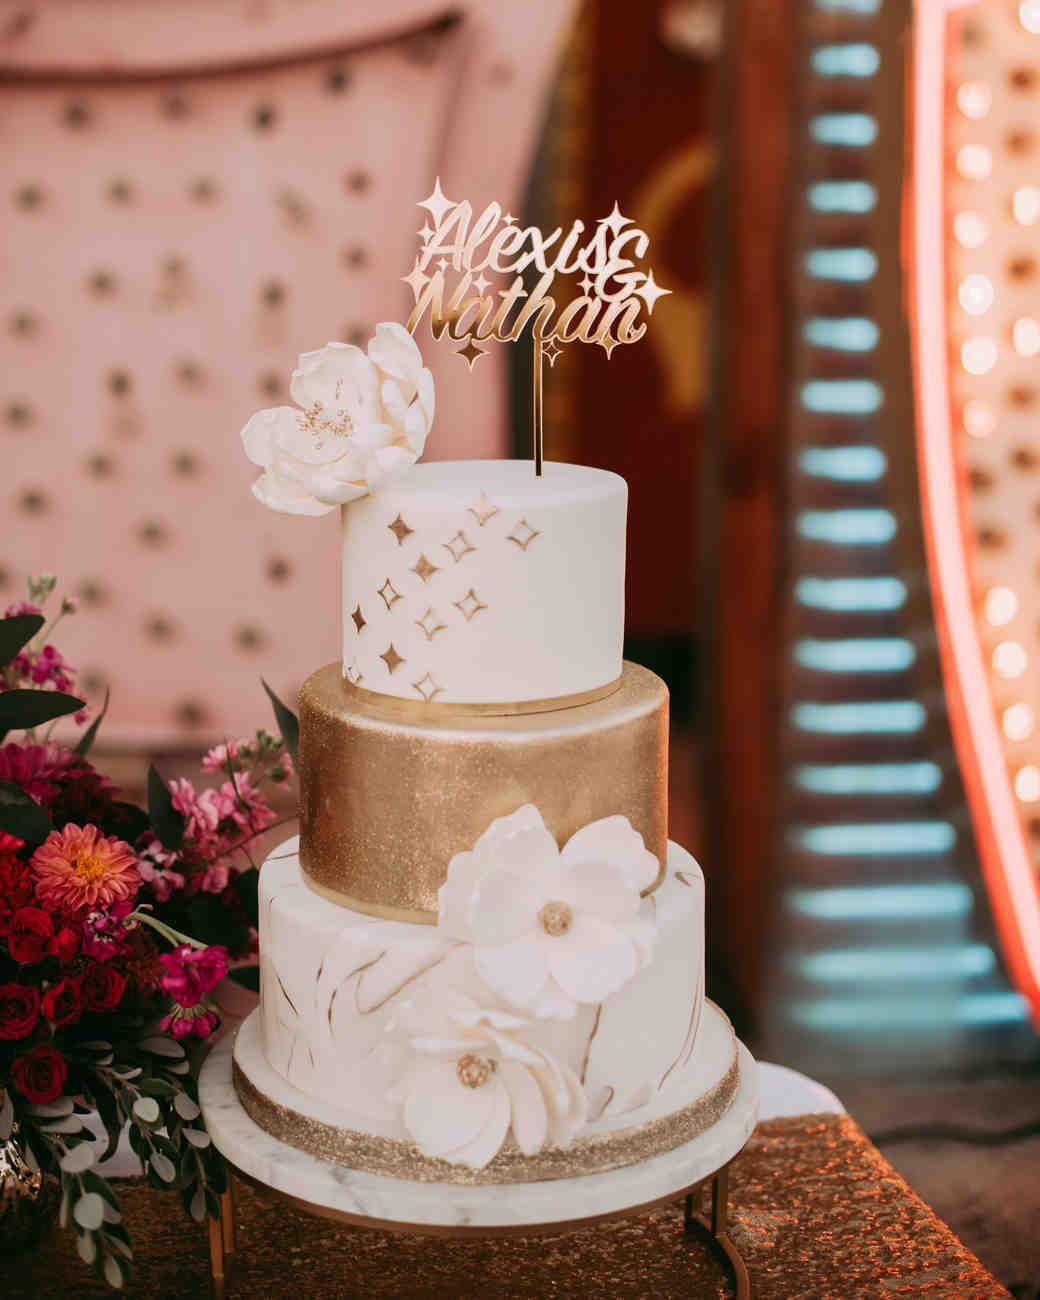 36 Of The Best Wedding Cake Toppers Groom Wedding Cakes Floral Wedding Cakes Wedding Cake Toppers